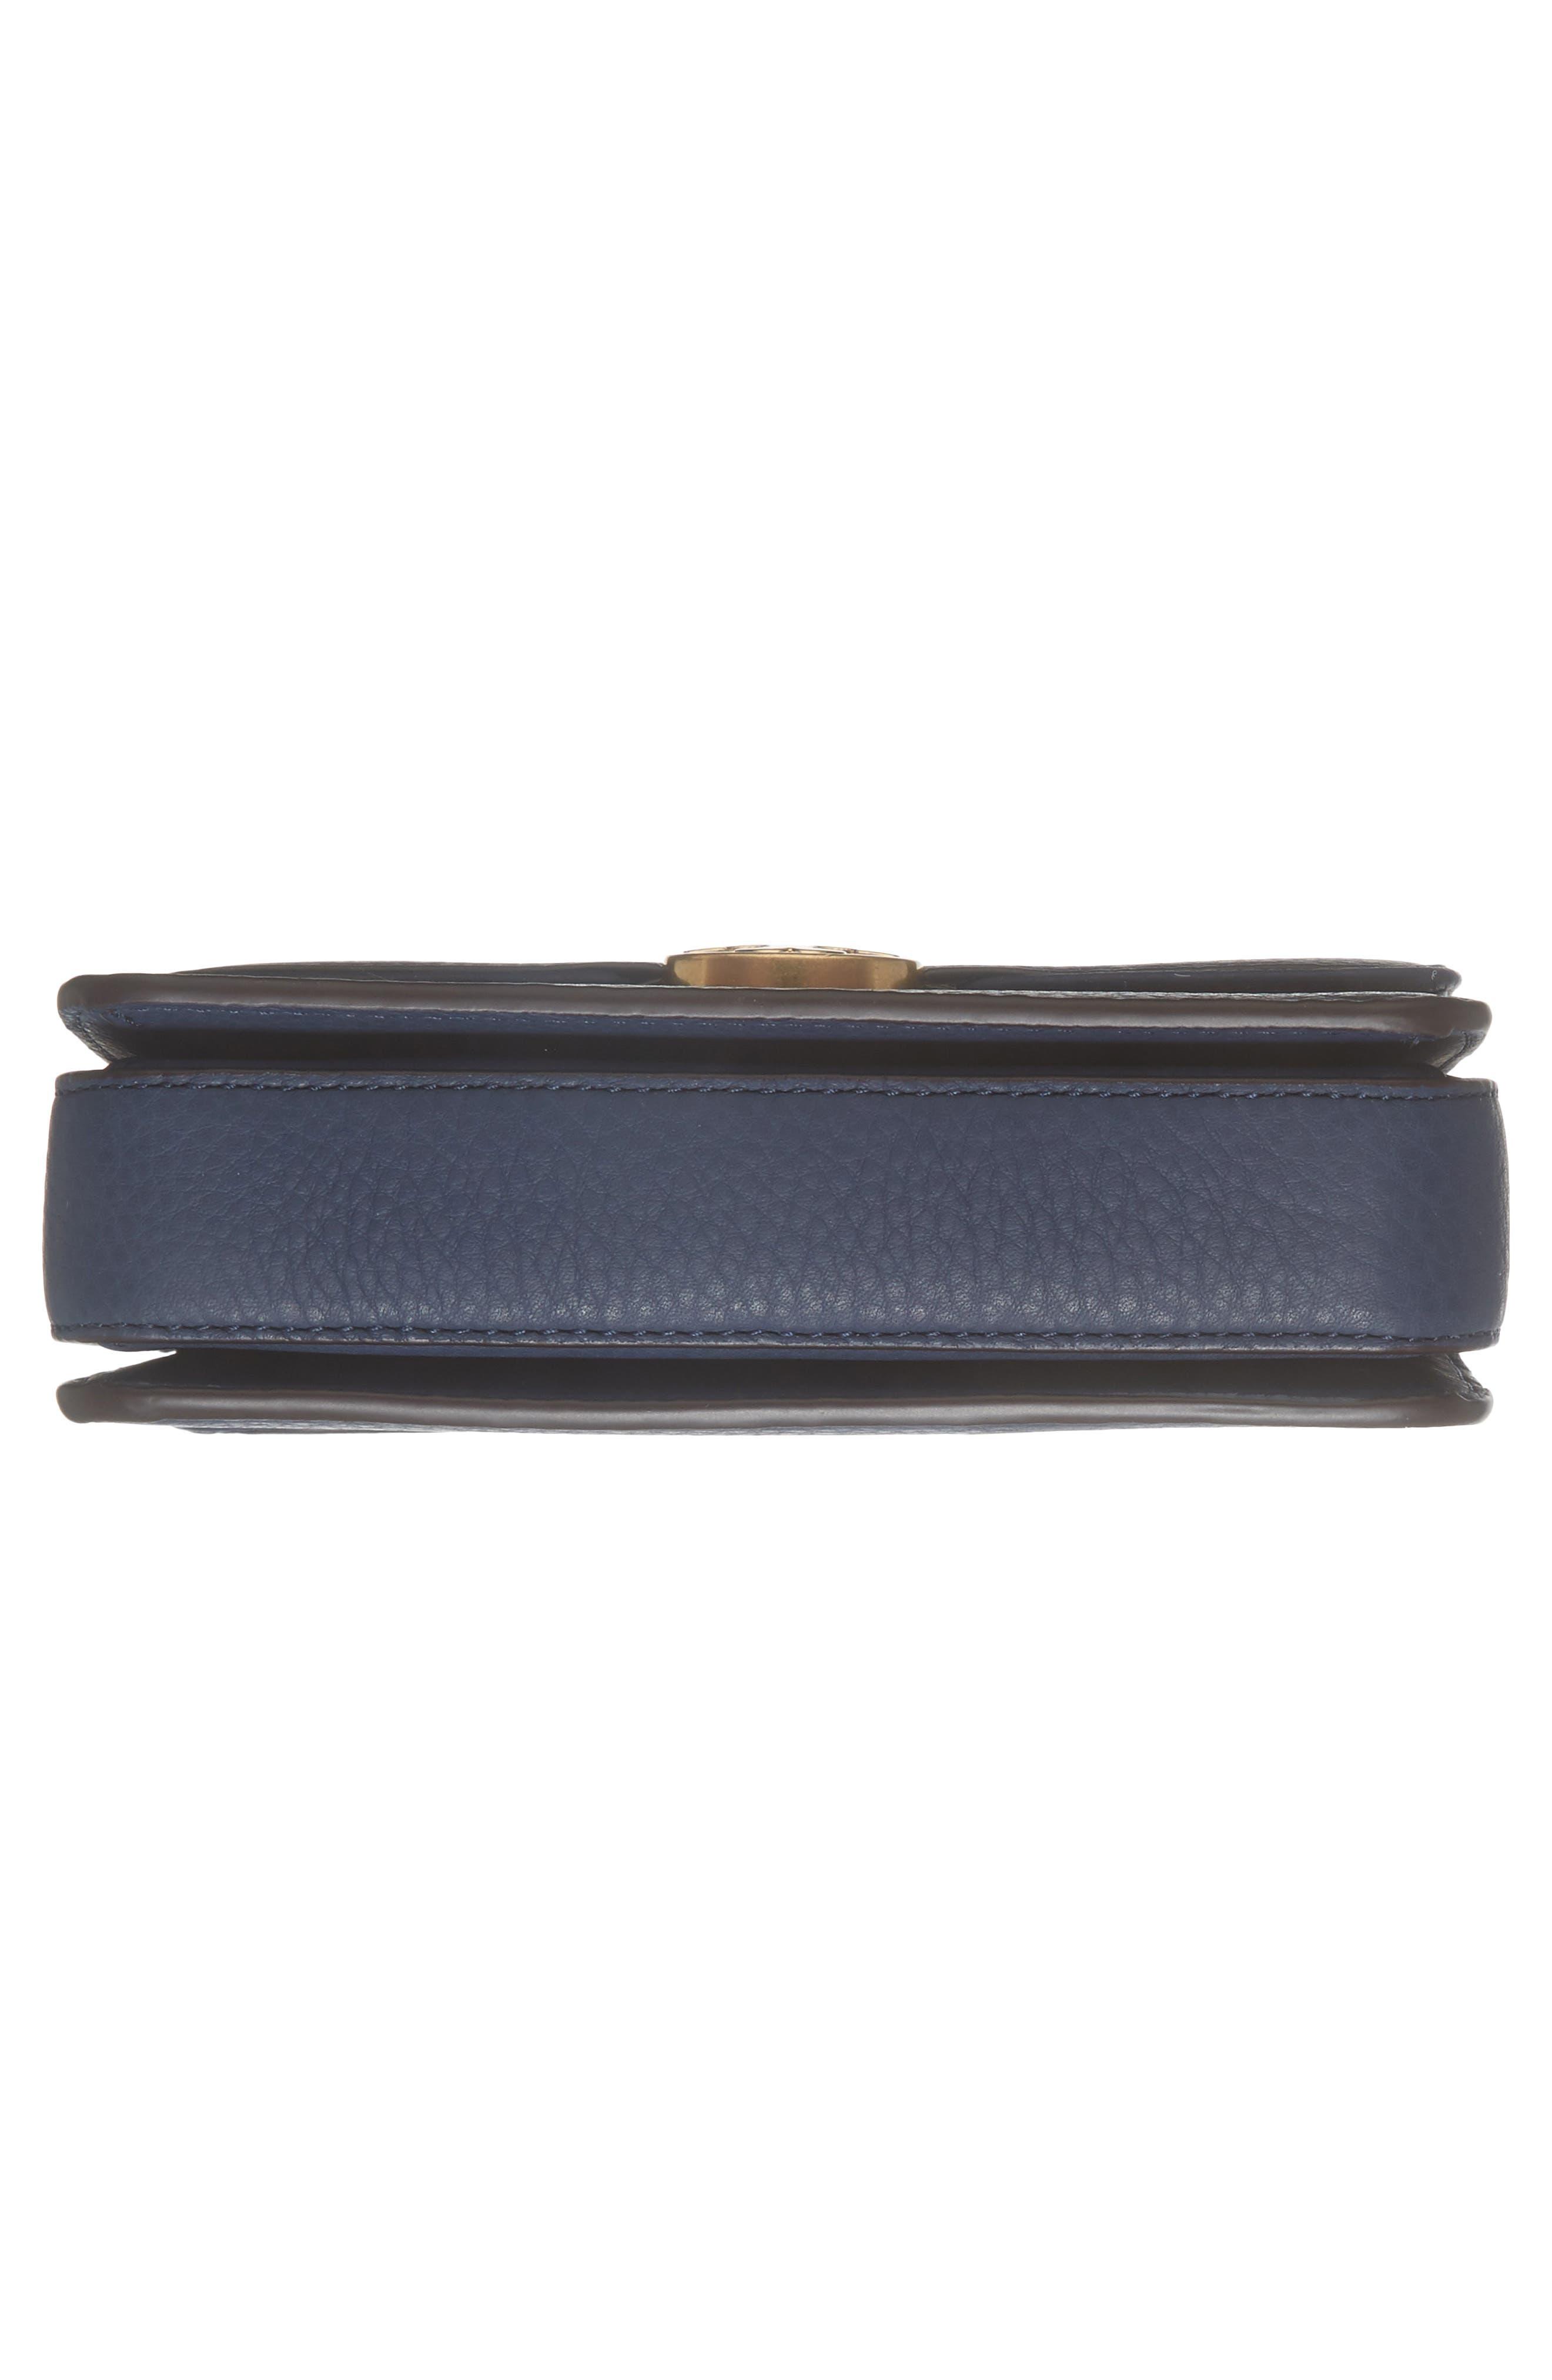 Mini Chelsea Leather Convertible Crossbody Bag,                             Alternate thumbnail 17, color,